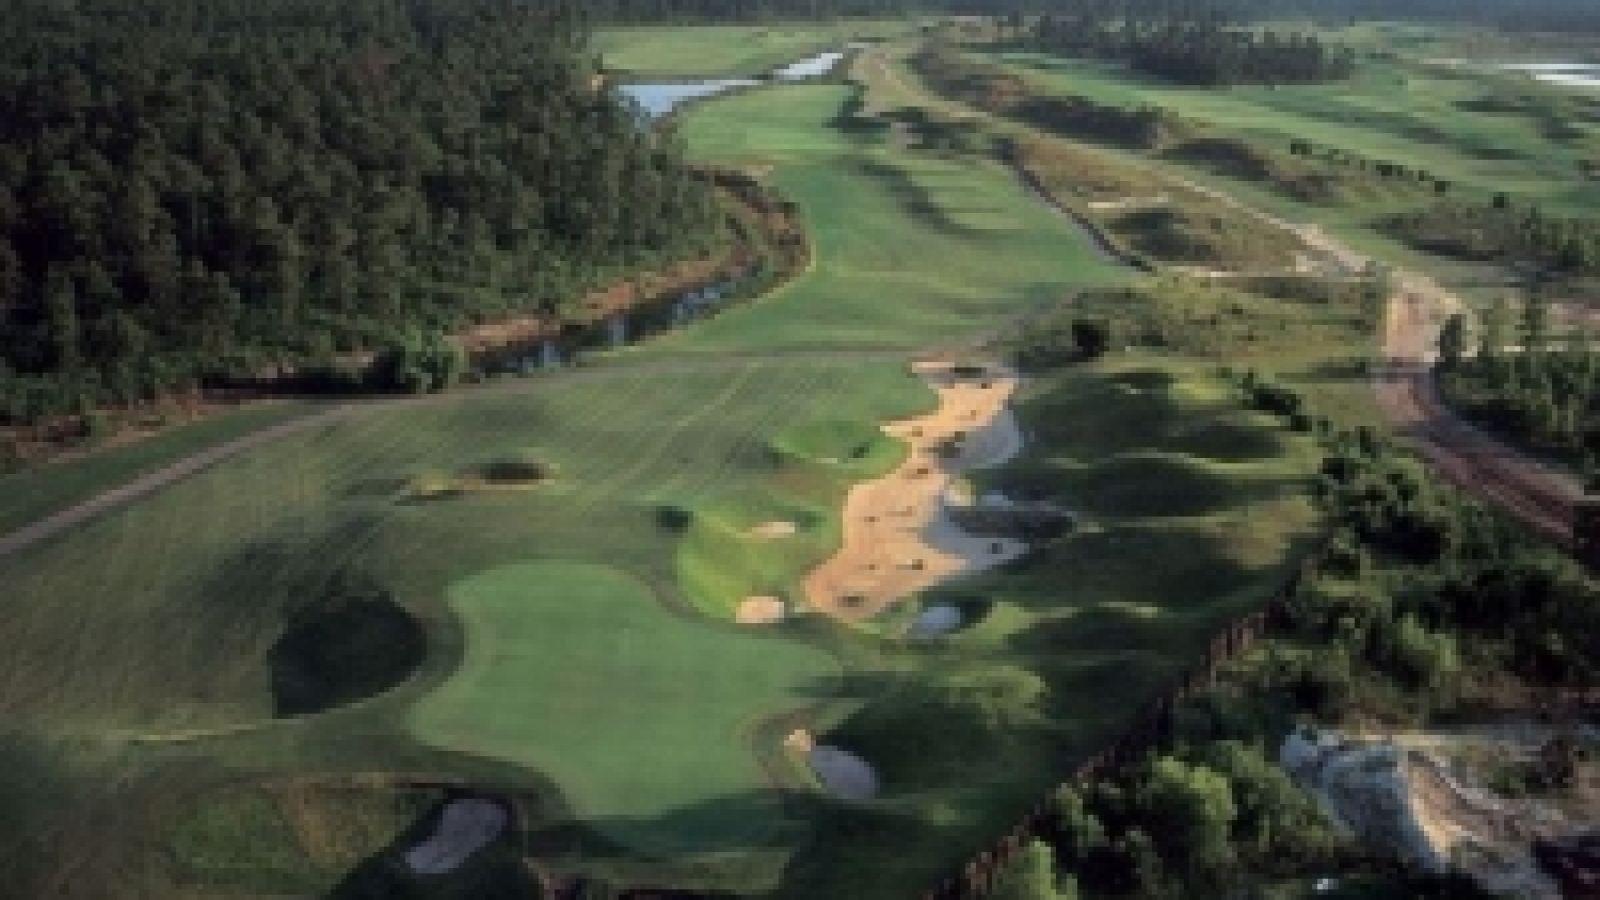 Legends Resorts - Myrtle Beach golf packages